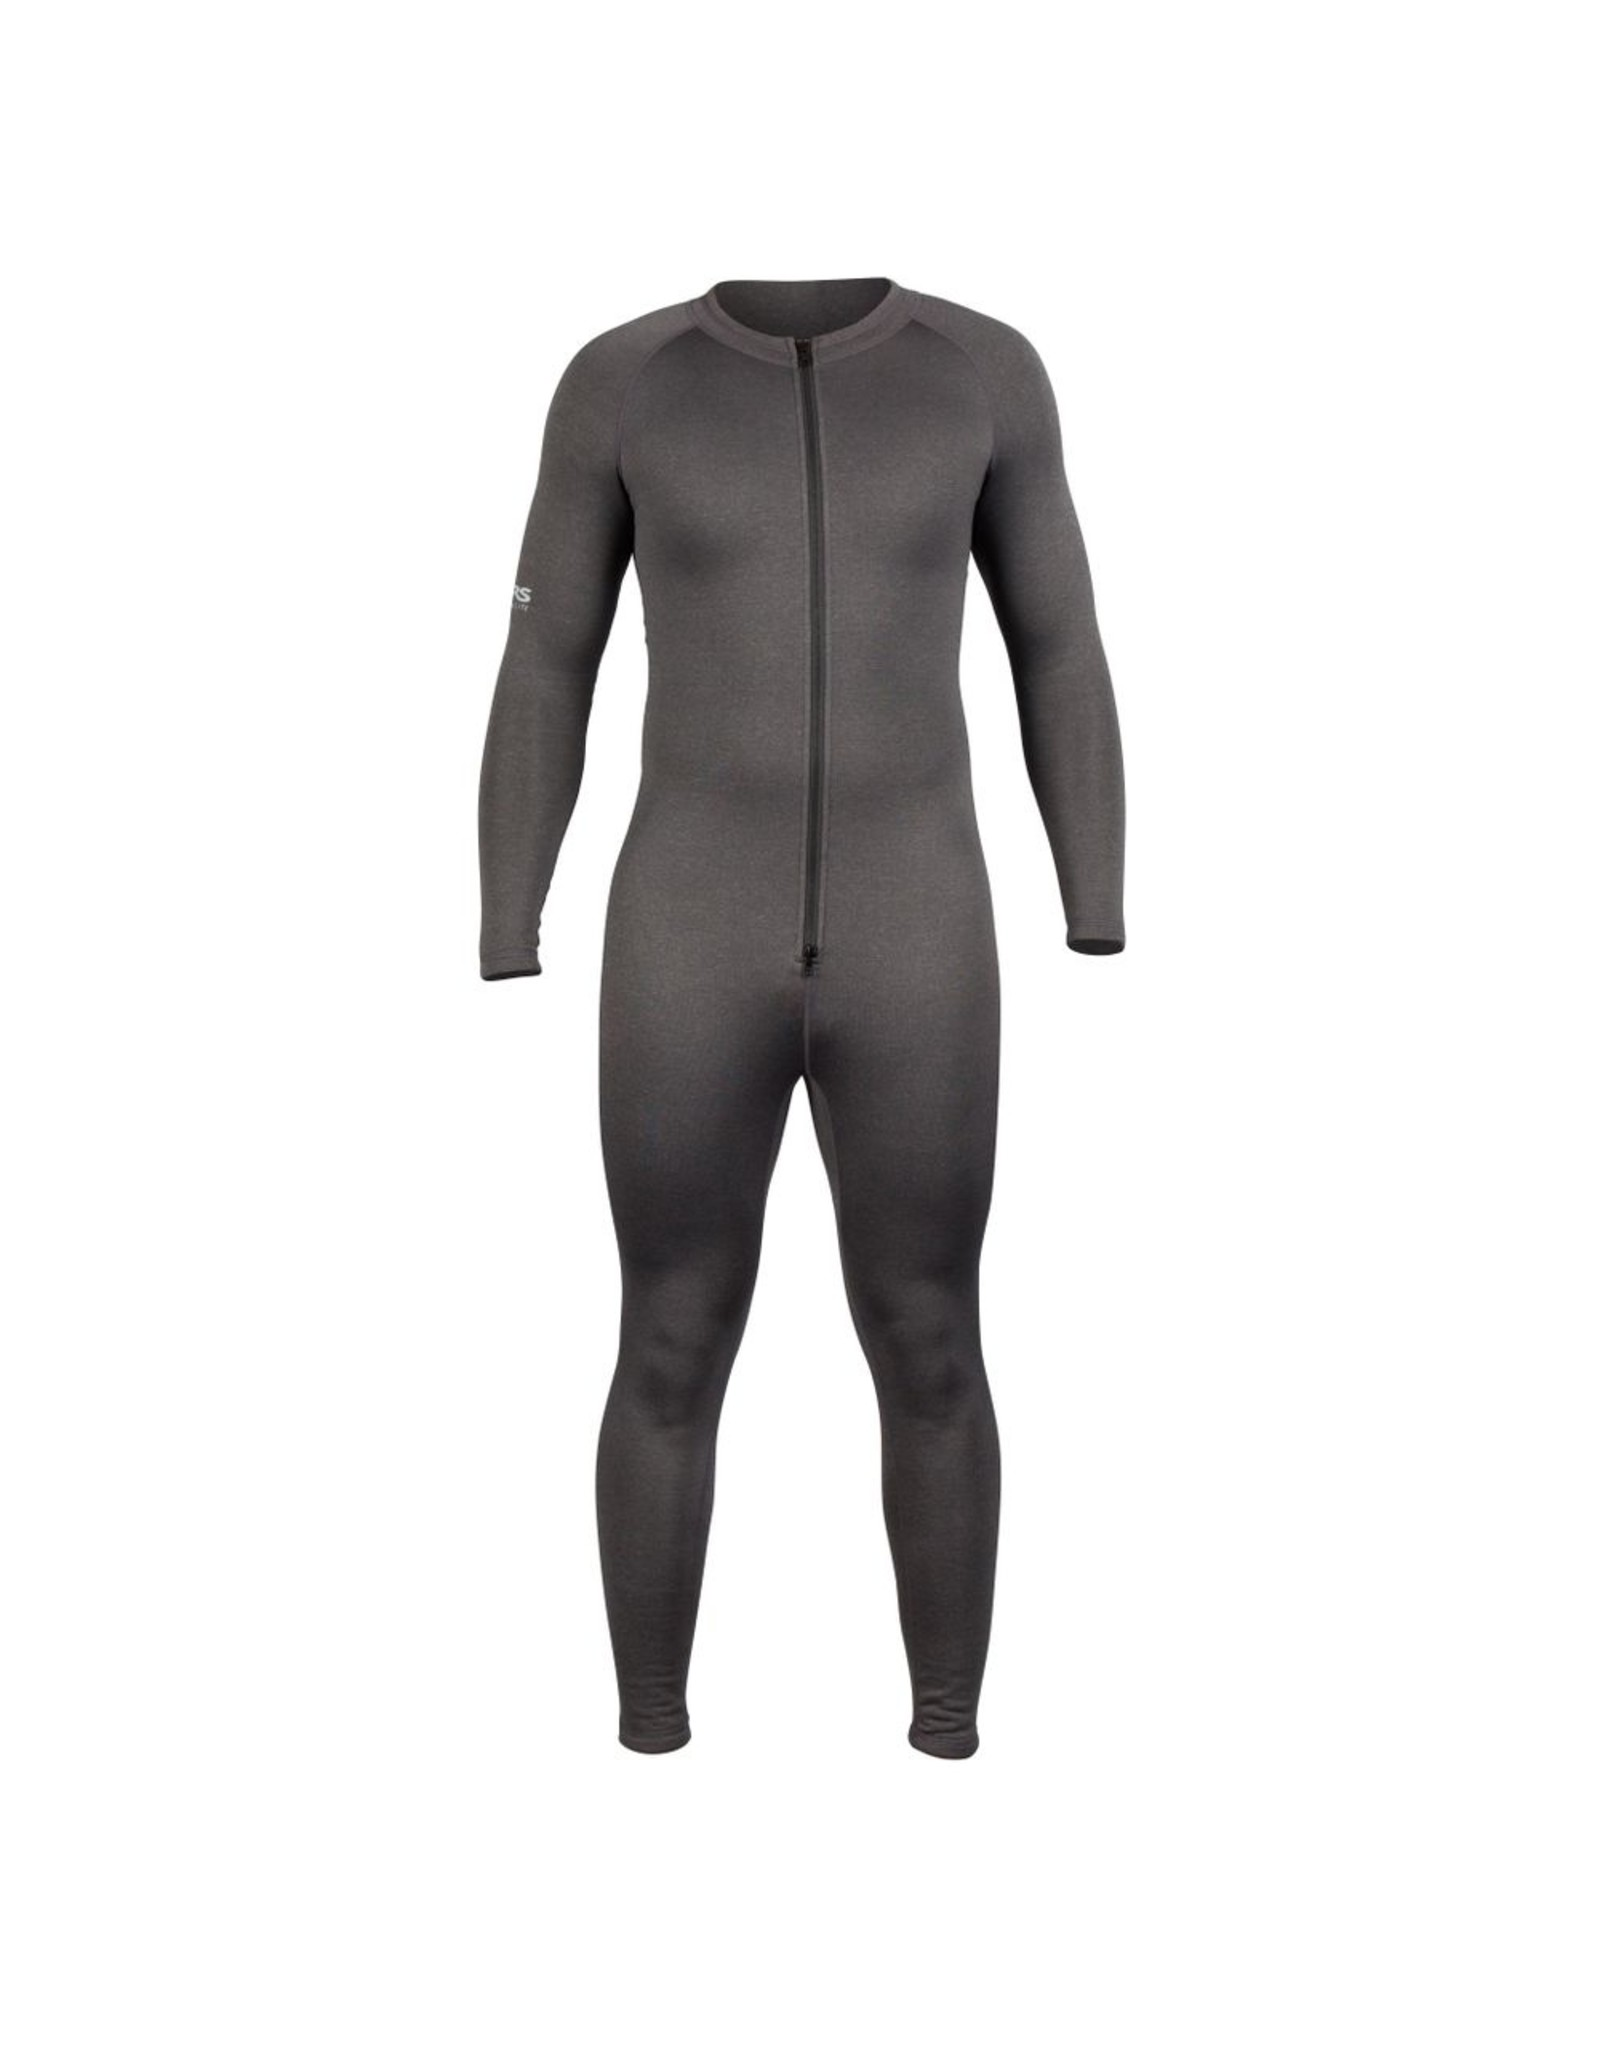 NRS NRS Expedition Union Suit  (LIQUIDATION)